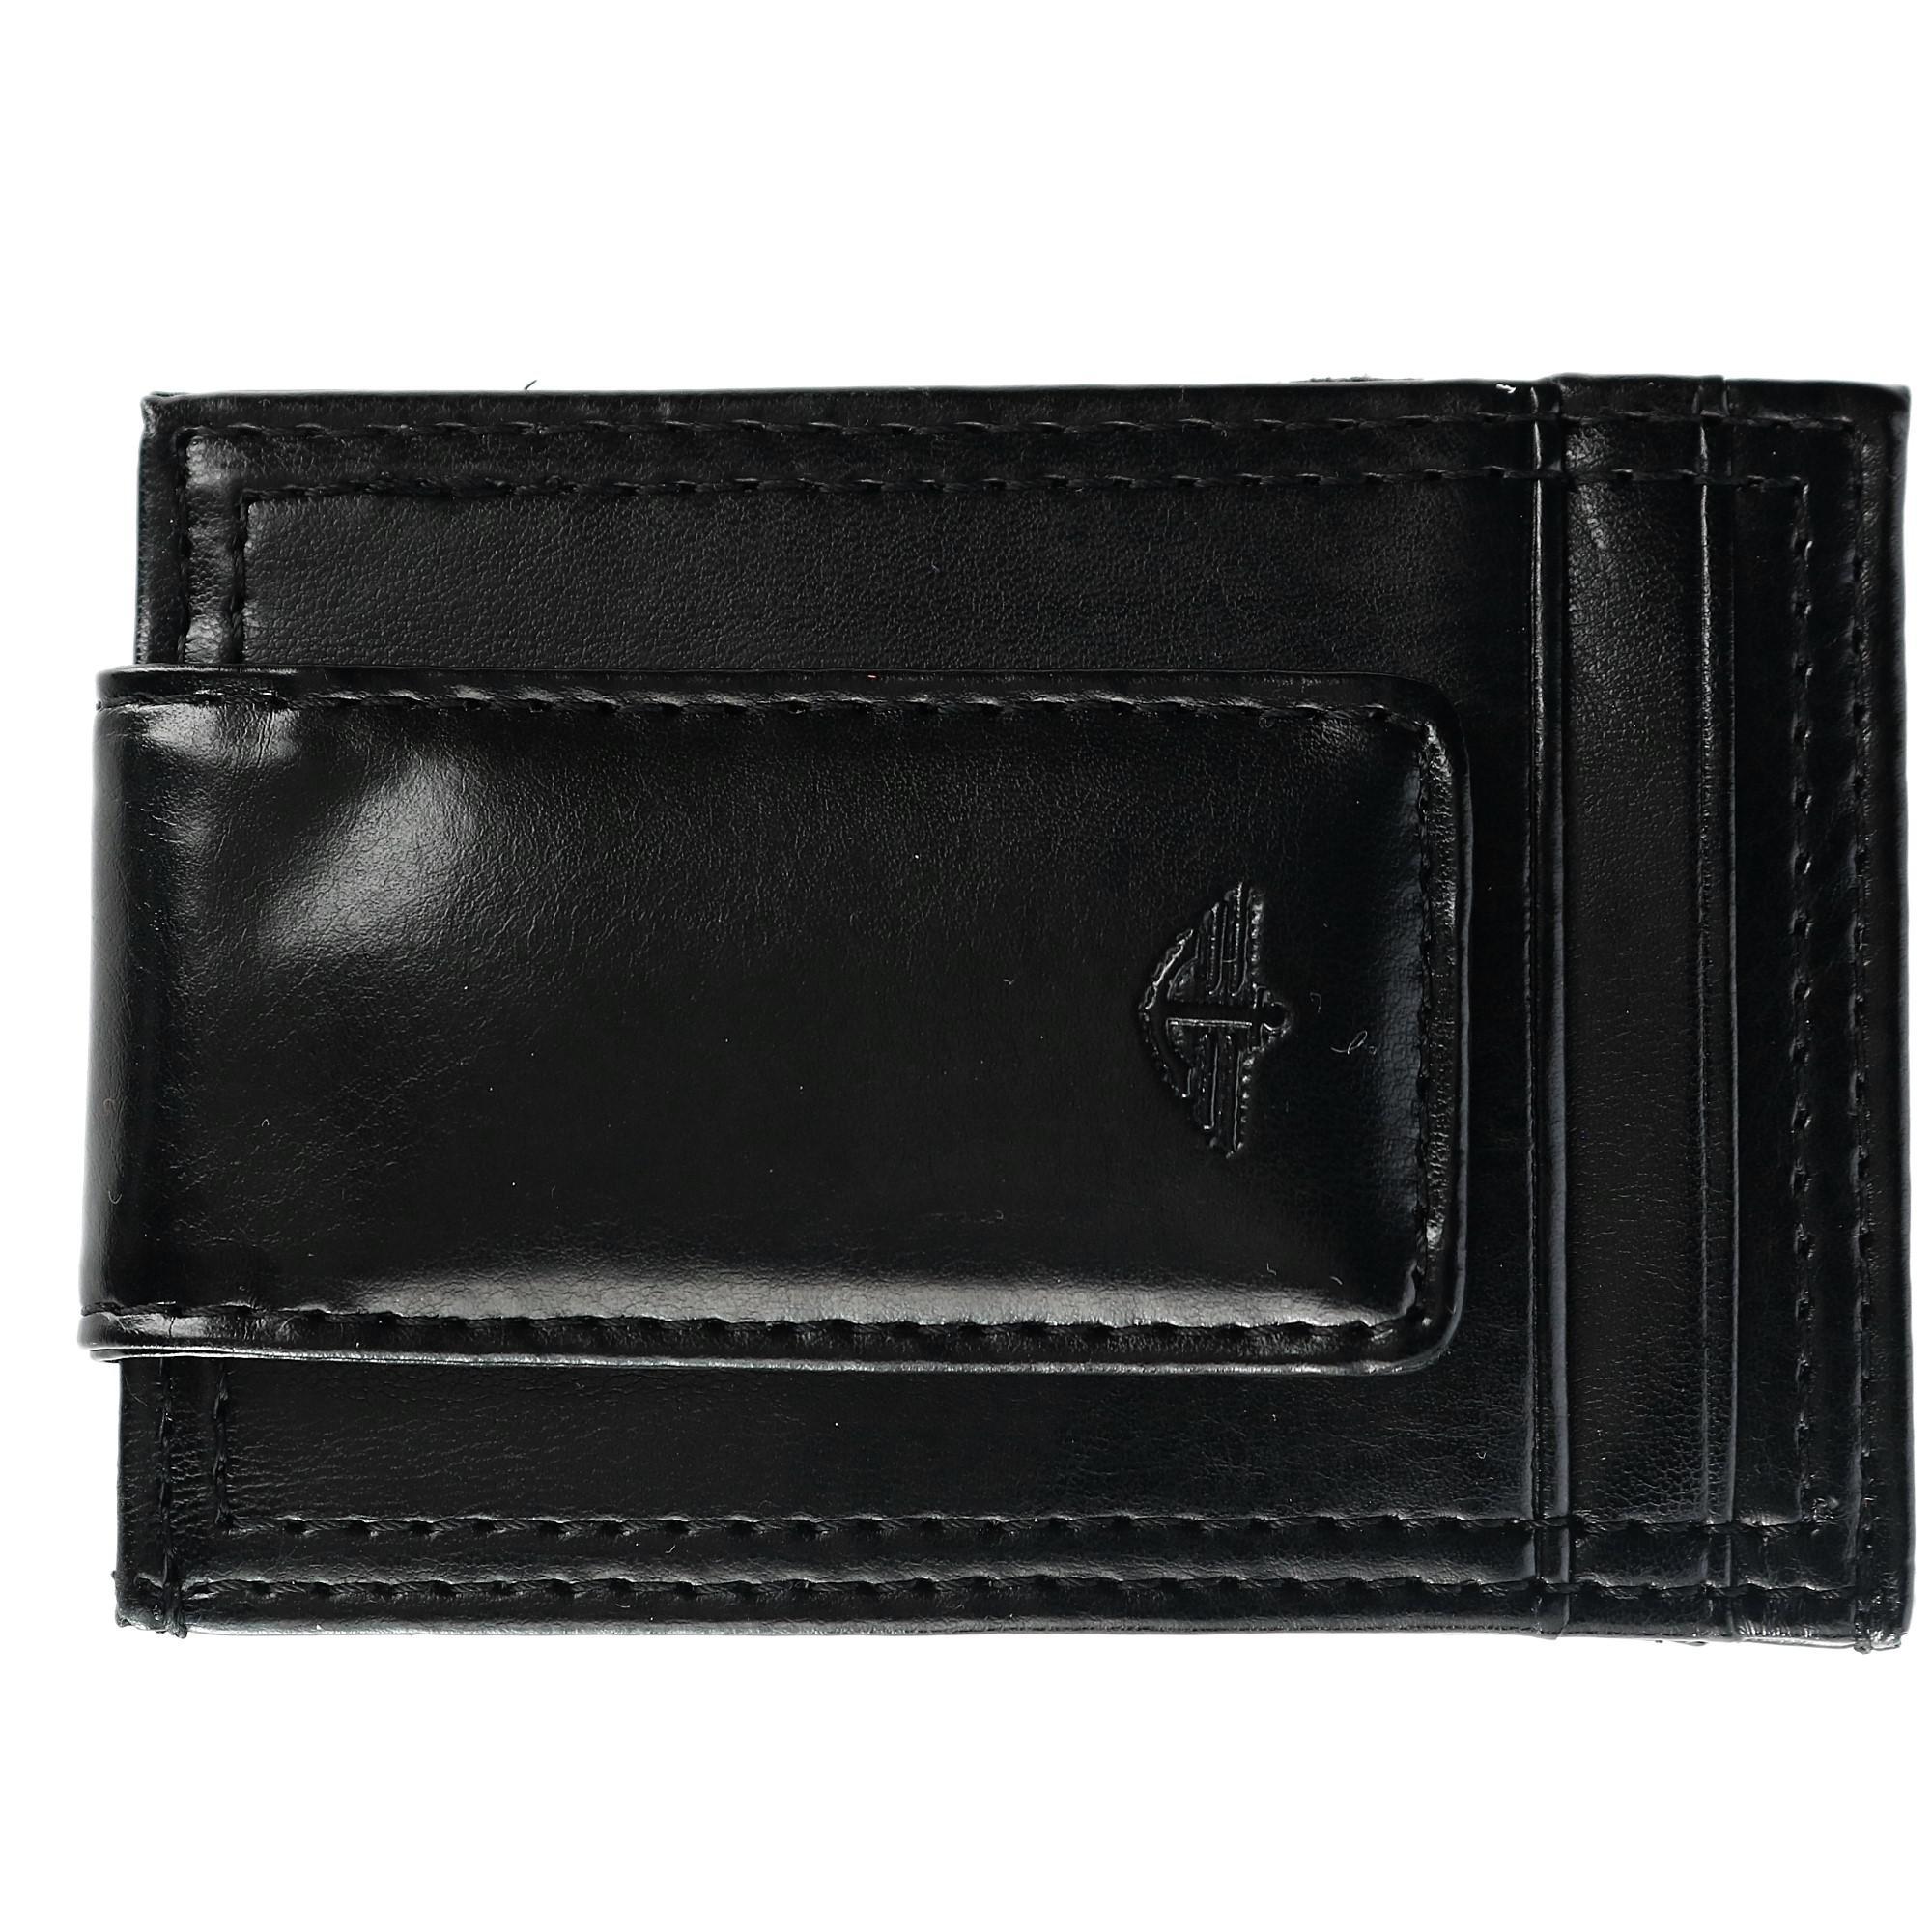 Dockers Men's Leather Slim Front Pocket Wallet With Magnetic Money Clip